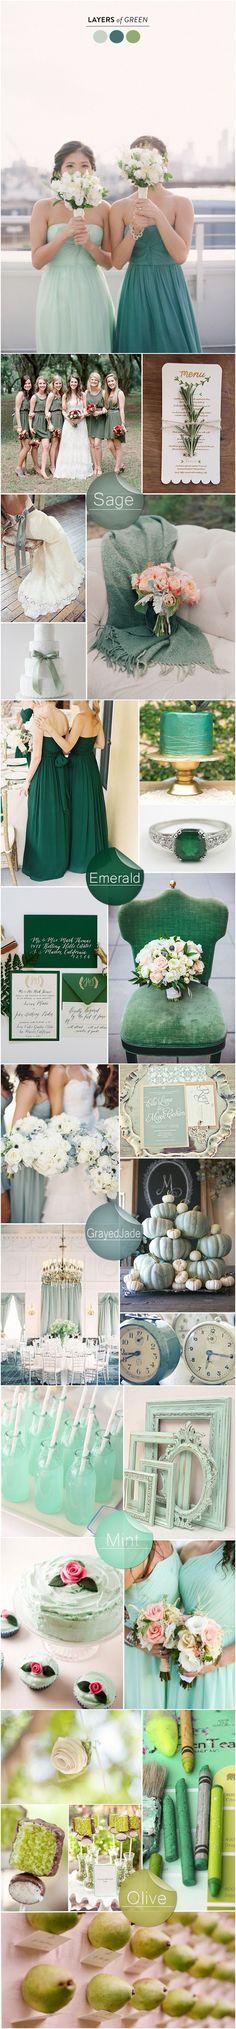 6 Perfect Shades of Green Wedding Color Ideas 2015 Trends #weddingcolors #weddingideas